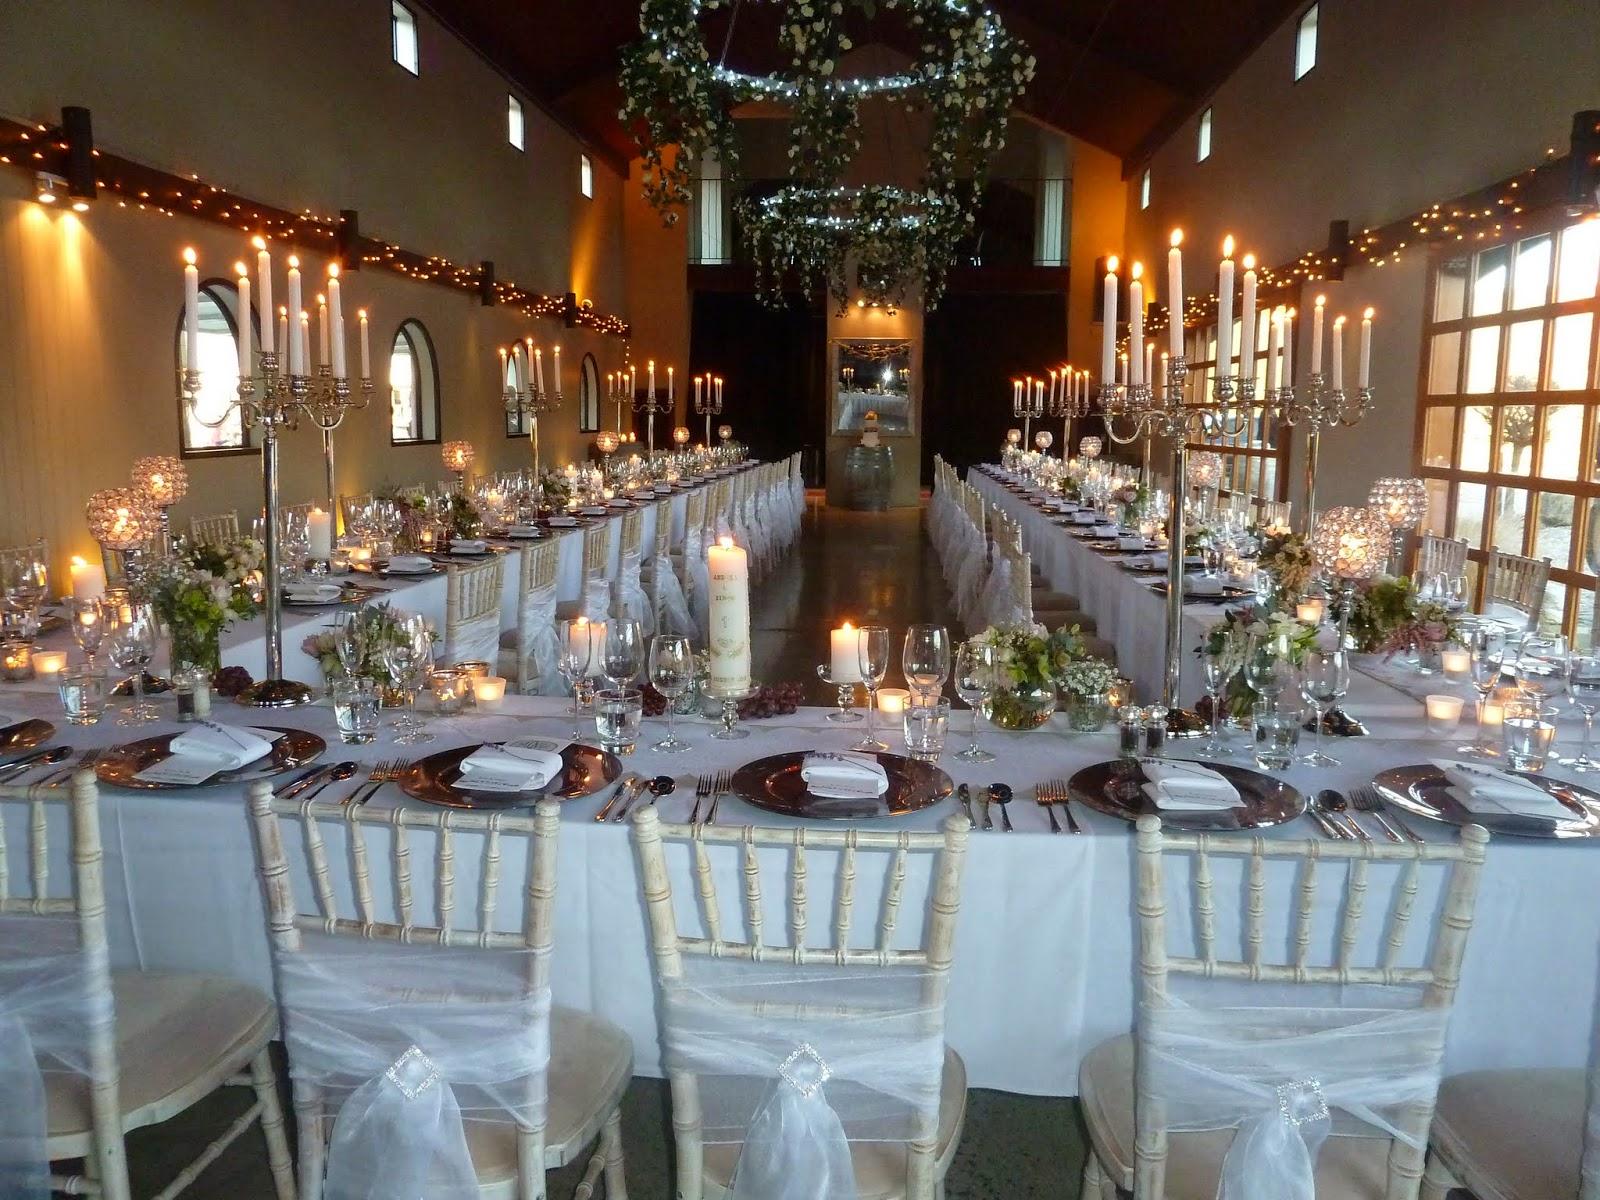 Mount soho venue weddings destination wedding queenstown mount soho destination wedding queenstown mount soho junglespirit Image collections